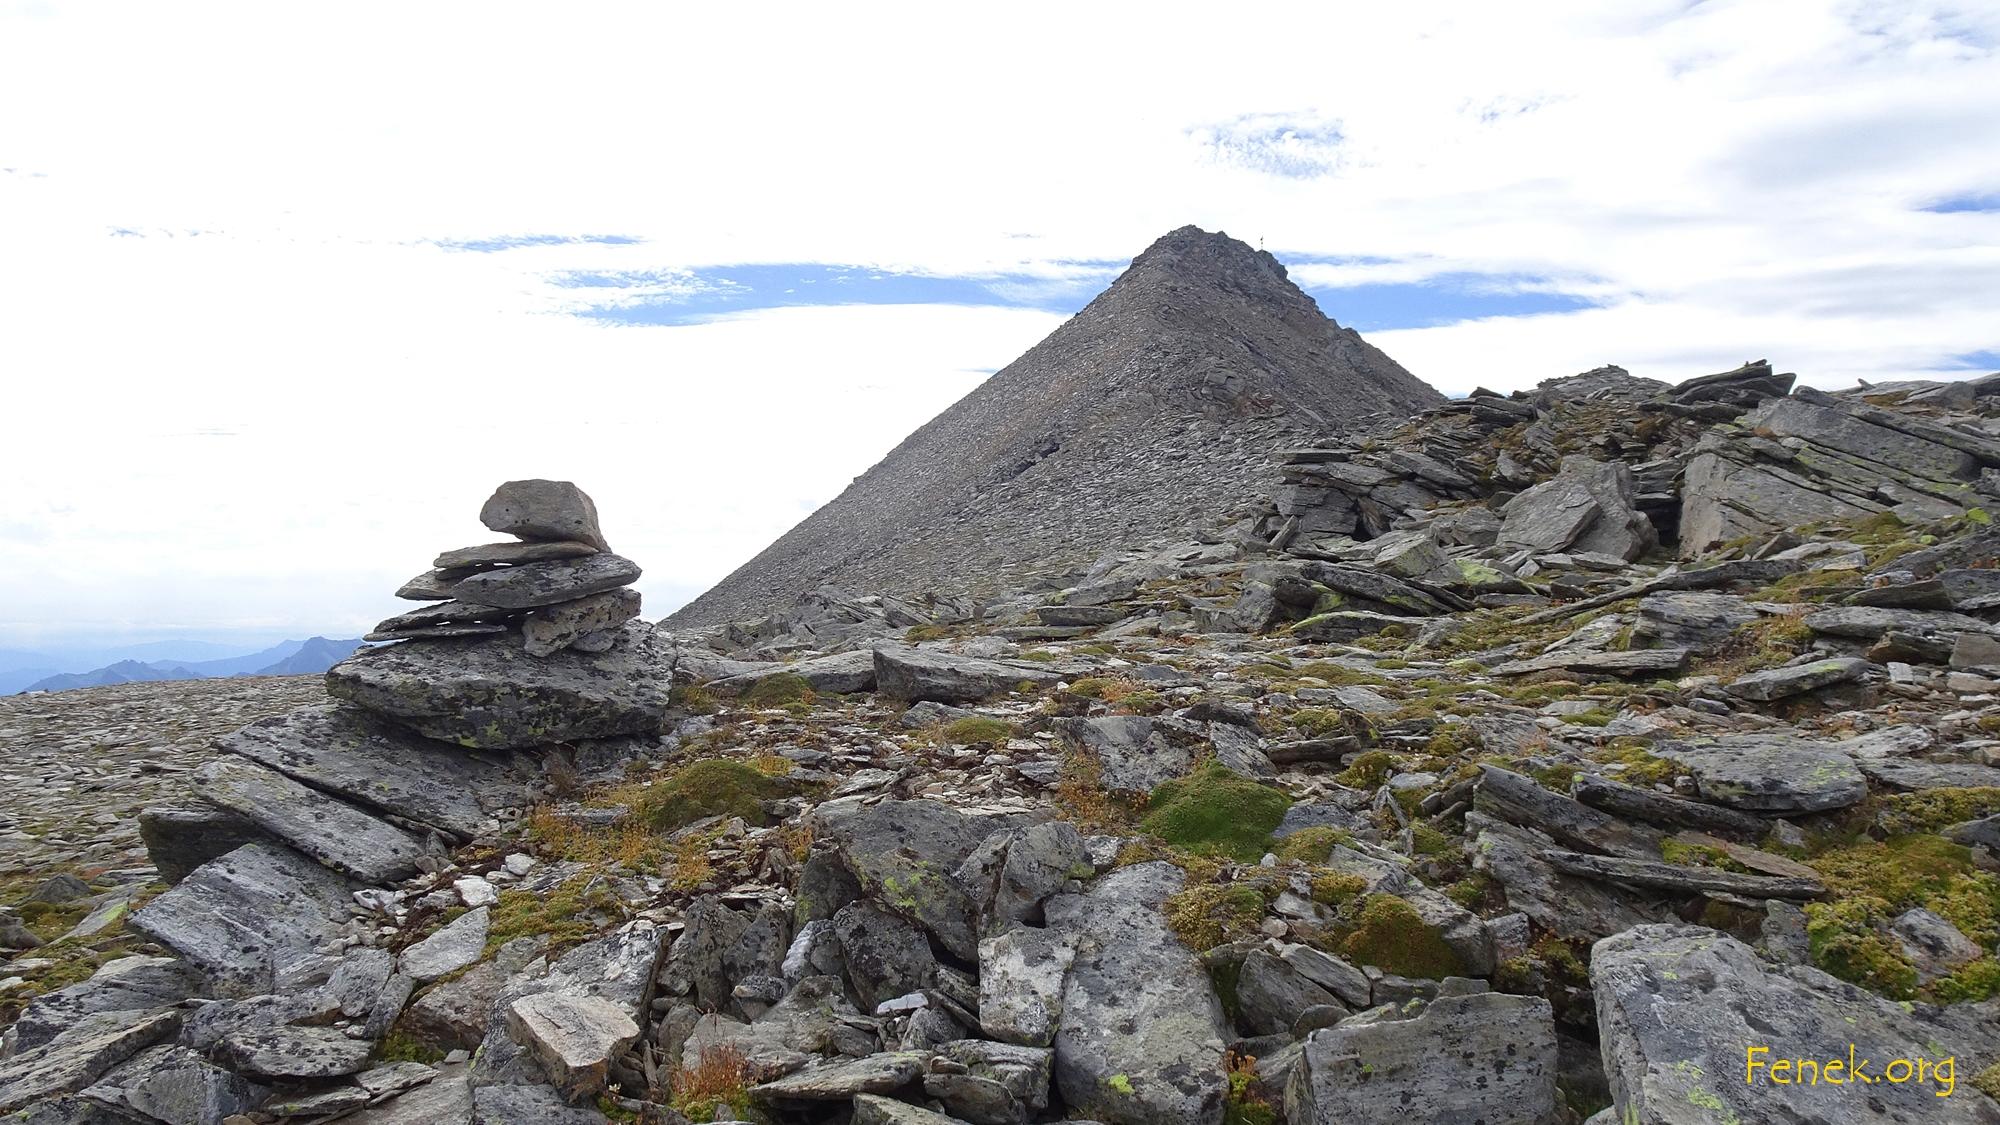 Gipfel Chesselhorn ahoi